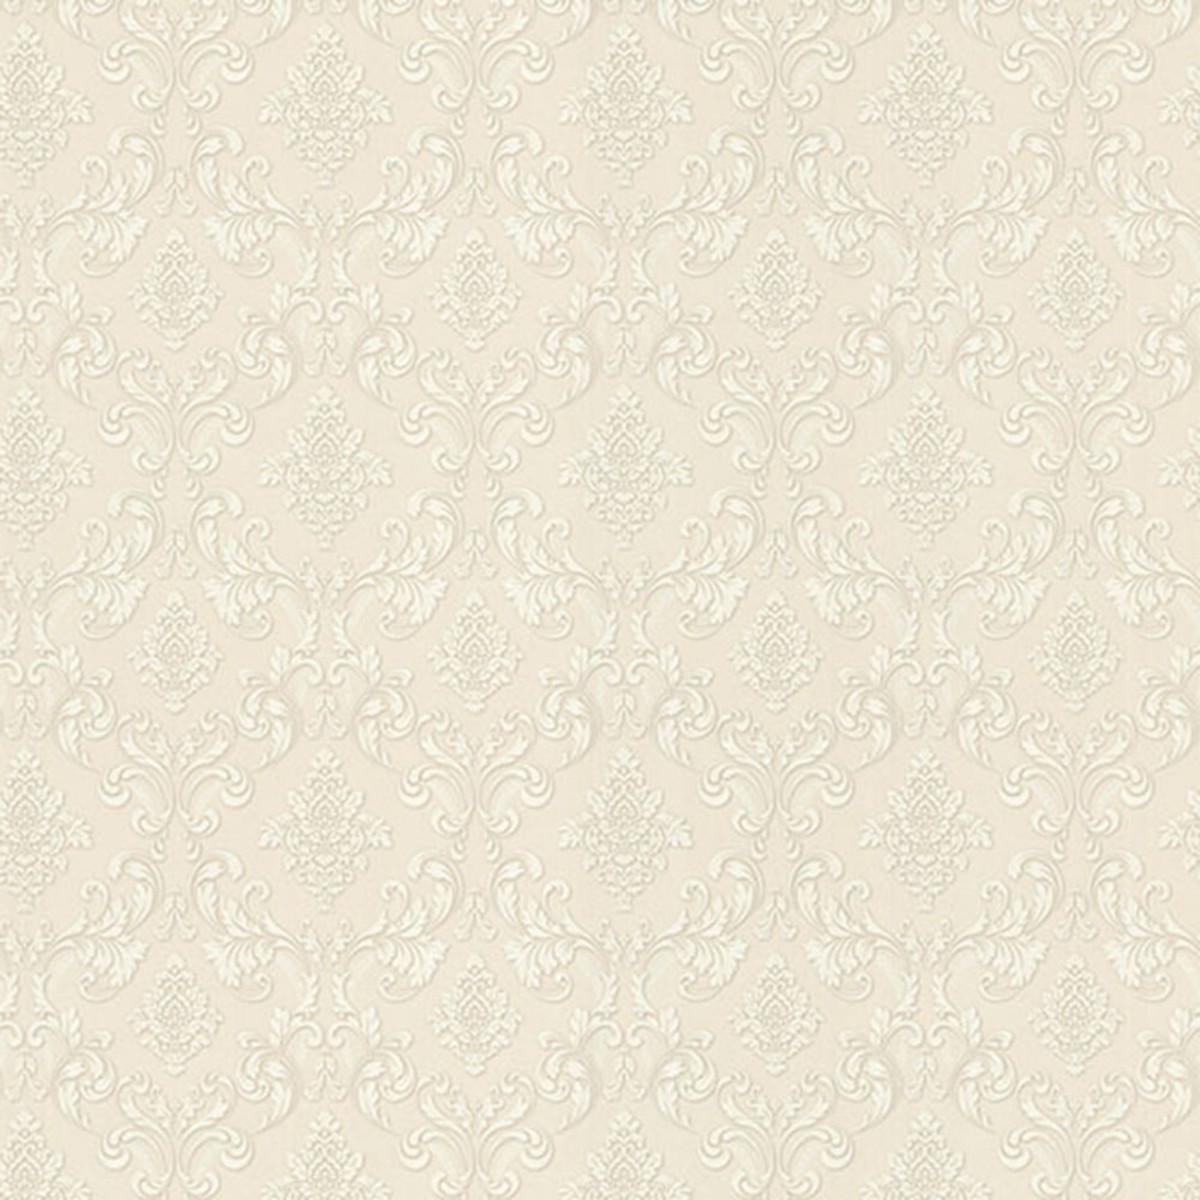 Обои флизелиновые Мир Авангард бежевые 1.06 м 45-217-05